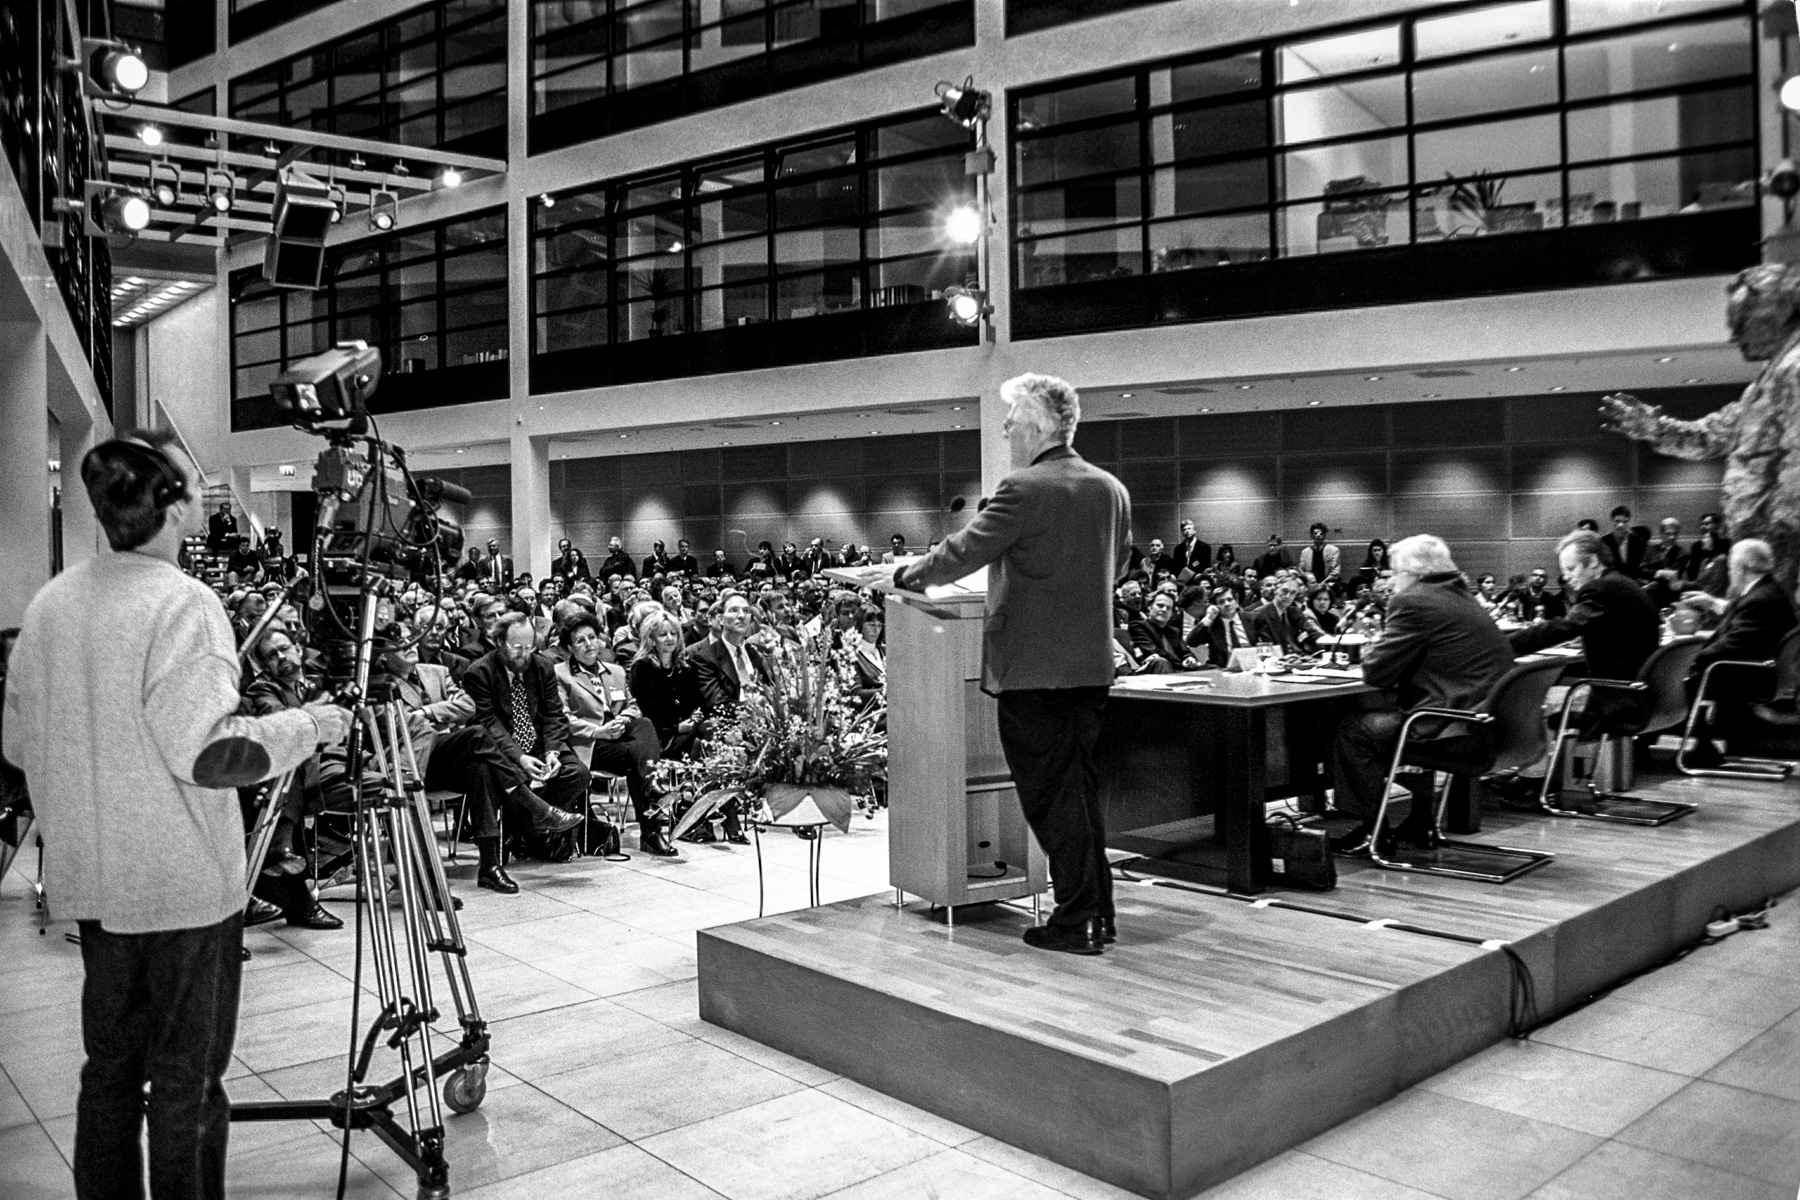 SPD Willy Brandt Haus Berlin Karsten D. Voigt